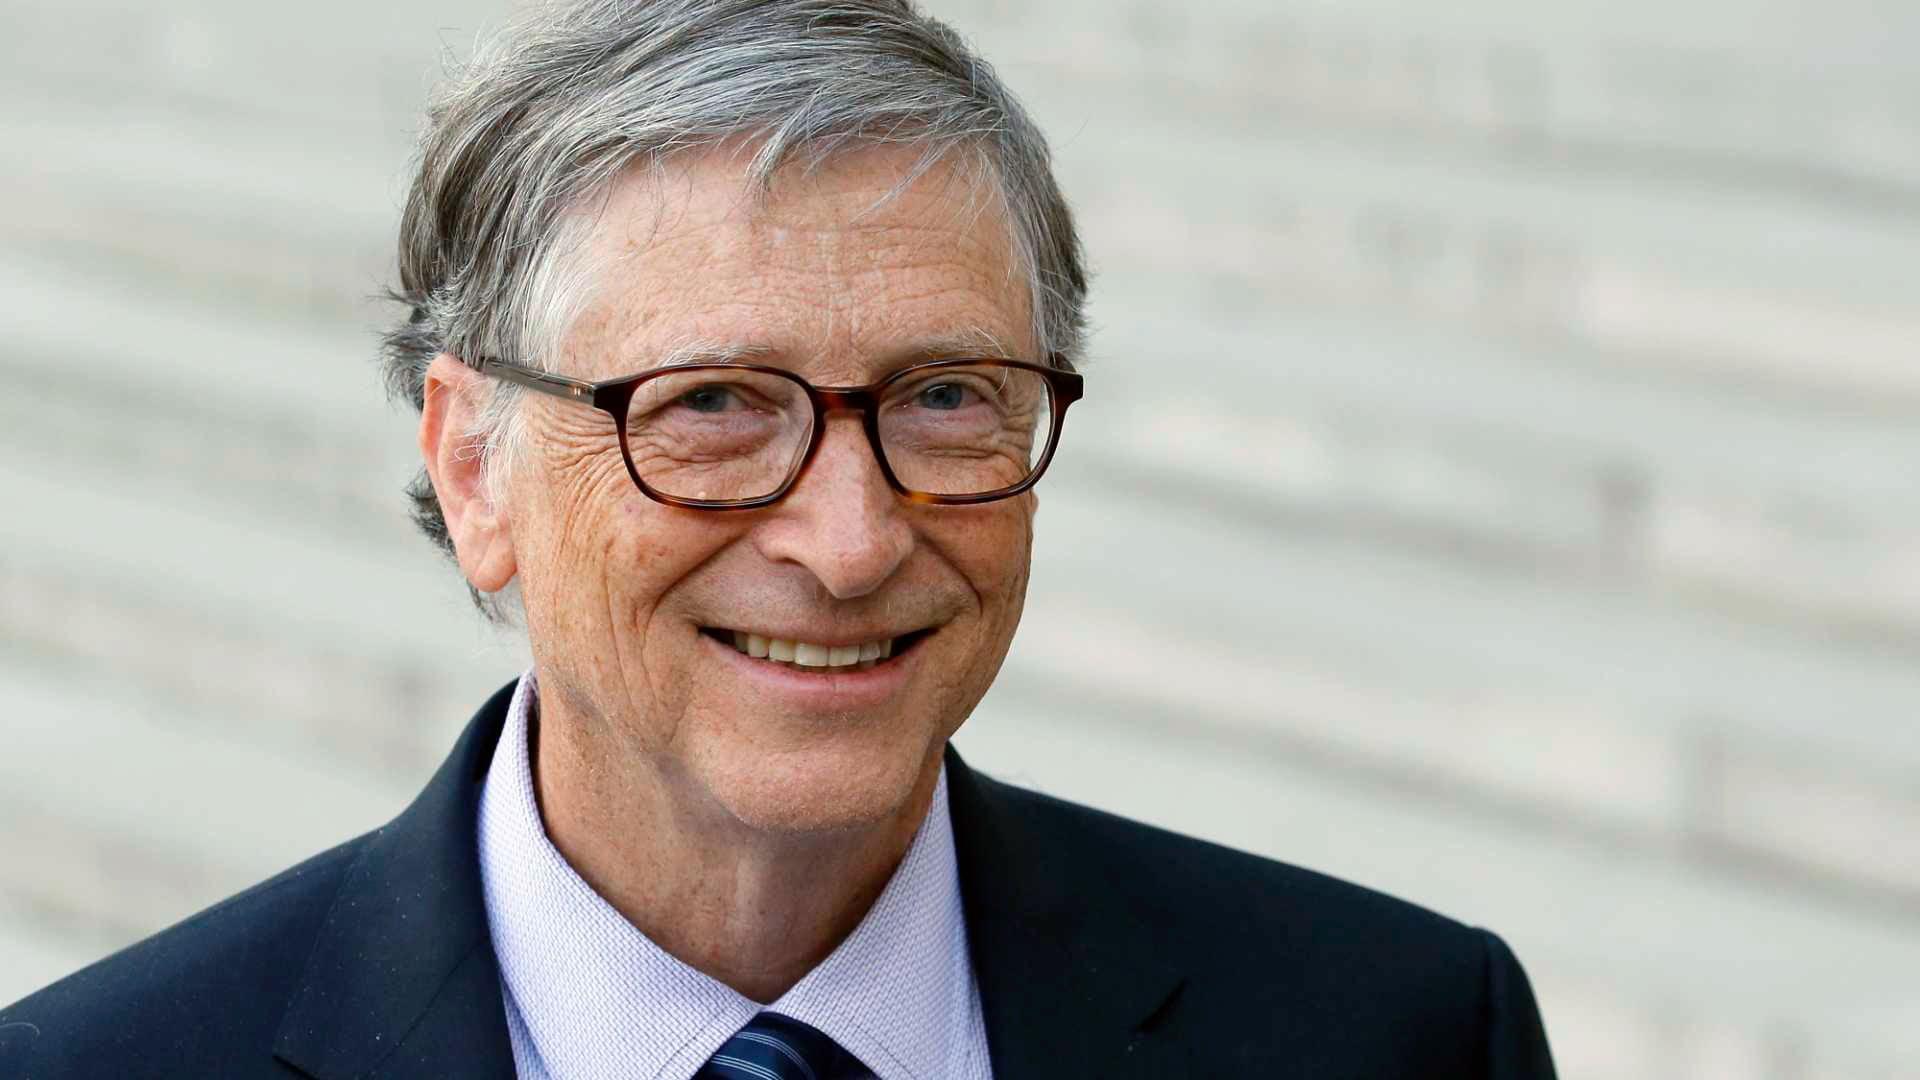 Билл Гейтс больше не критикует биткоин